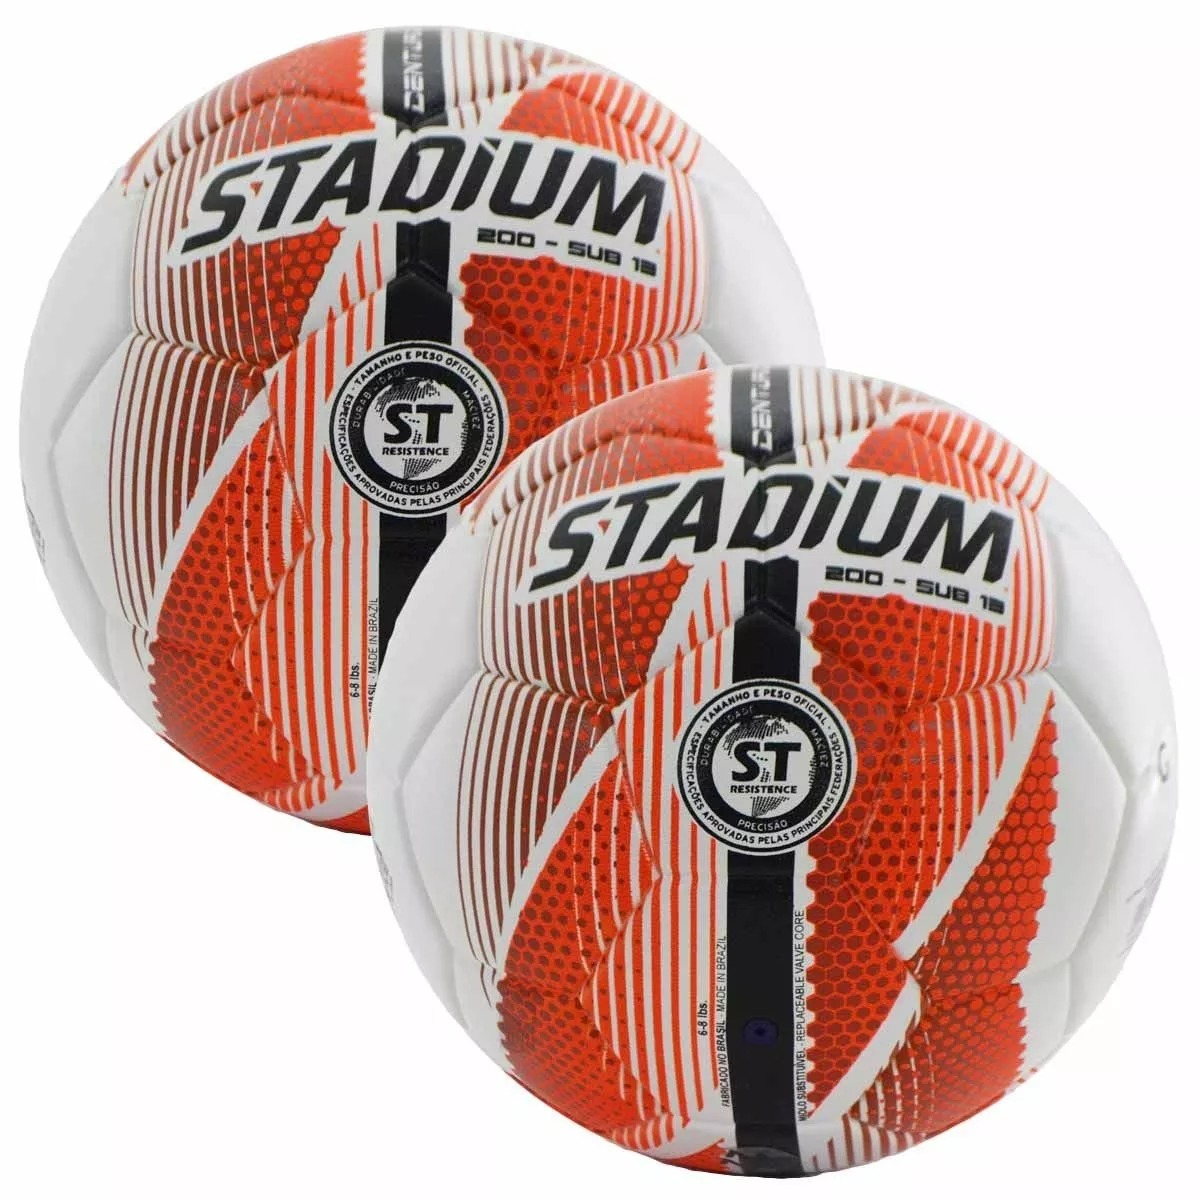 ... bolas sub13 stadium centurion max200 futsal + bomba. Carregando zoom. eb386a7010b99